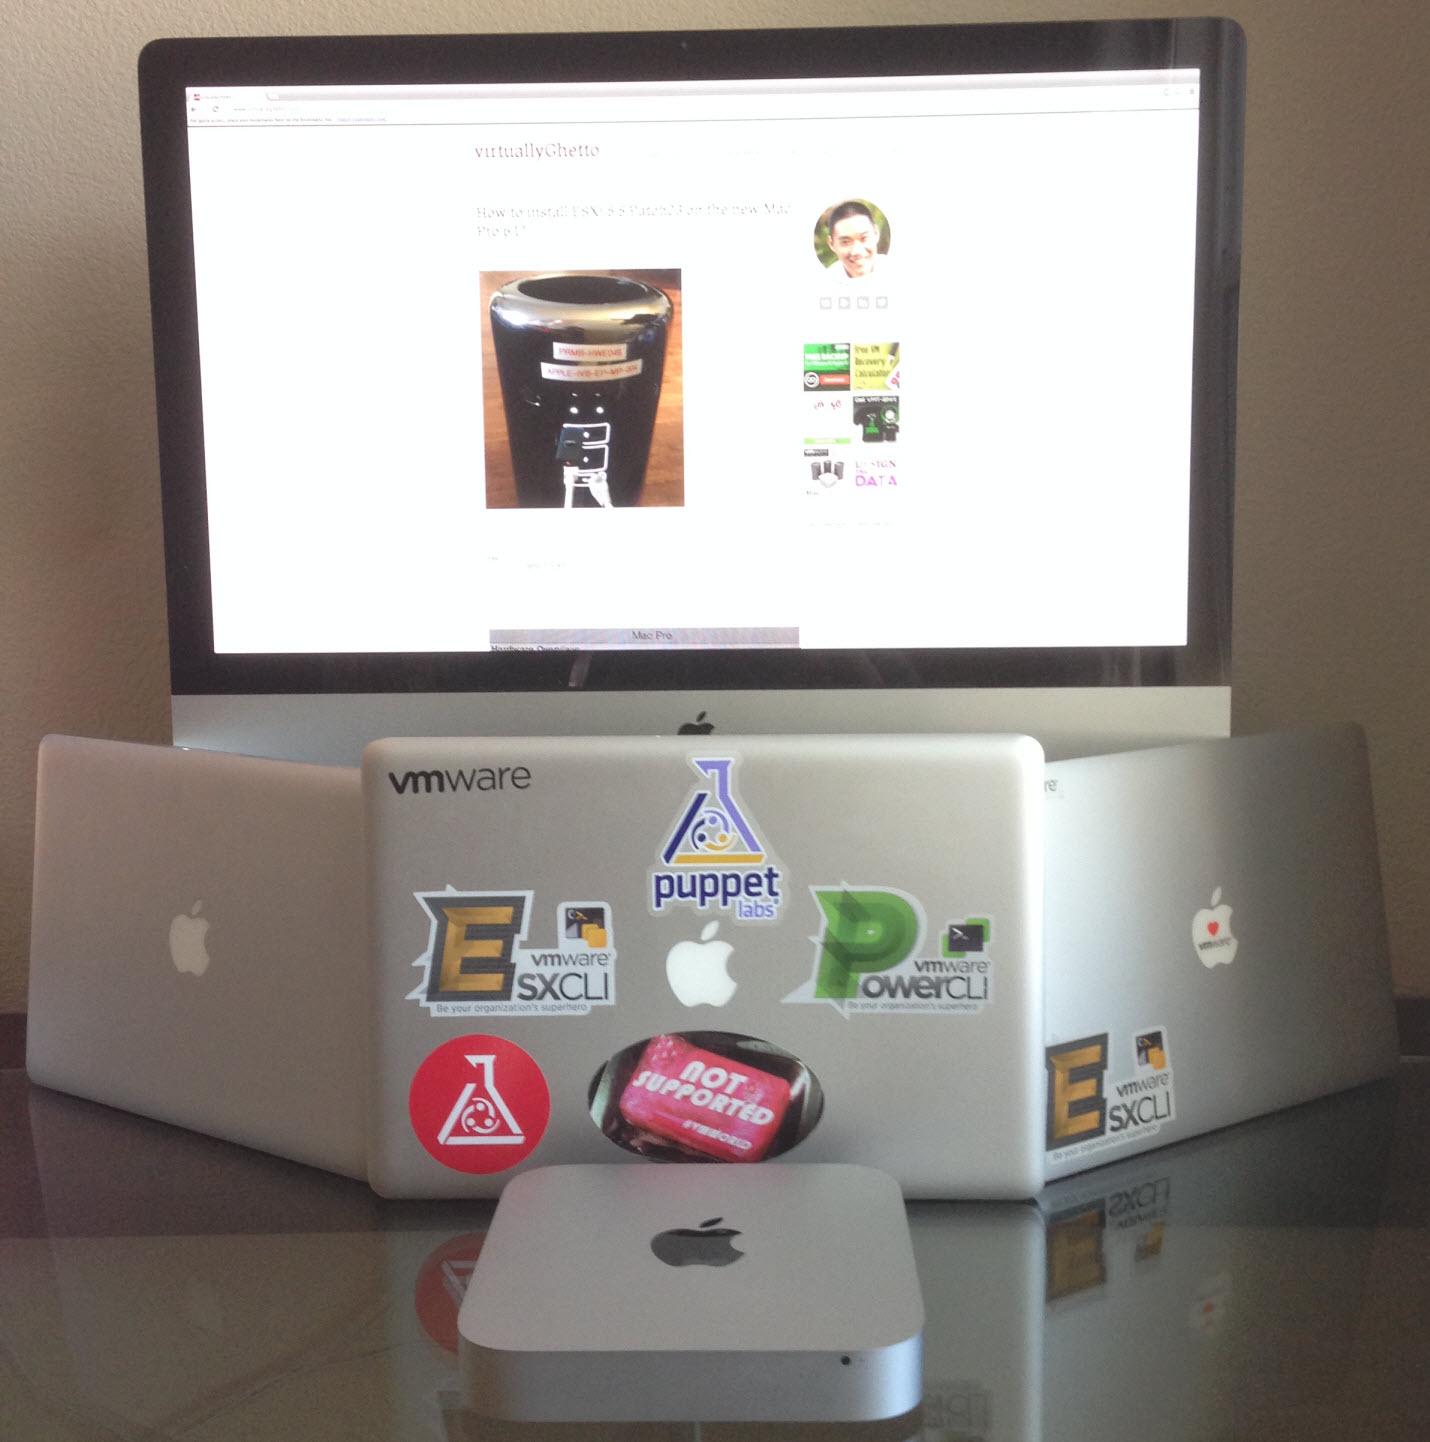 run-esxi-on-macbookpro-macbookair-imac